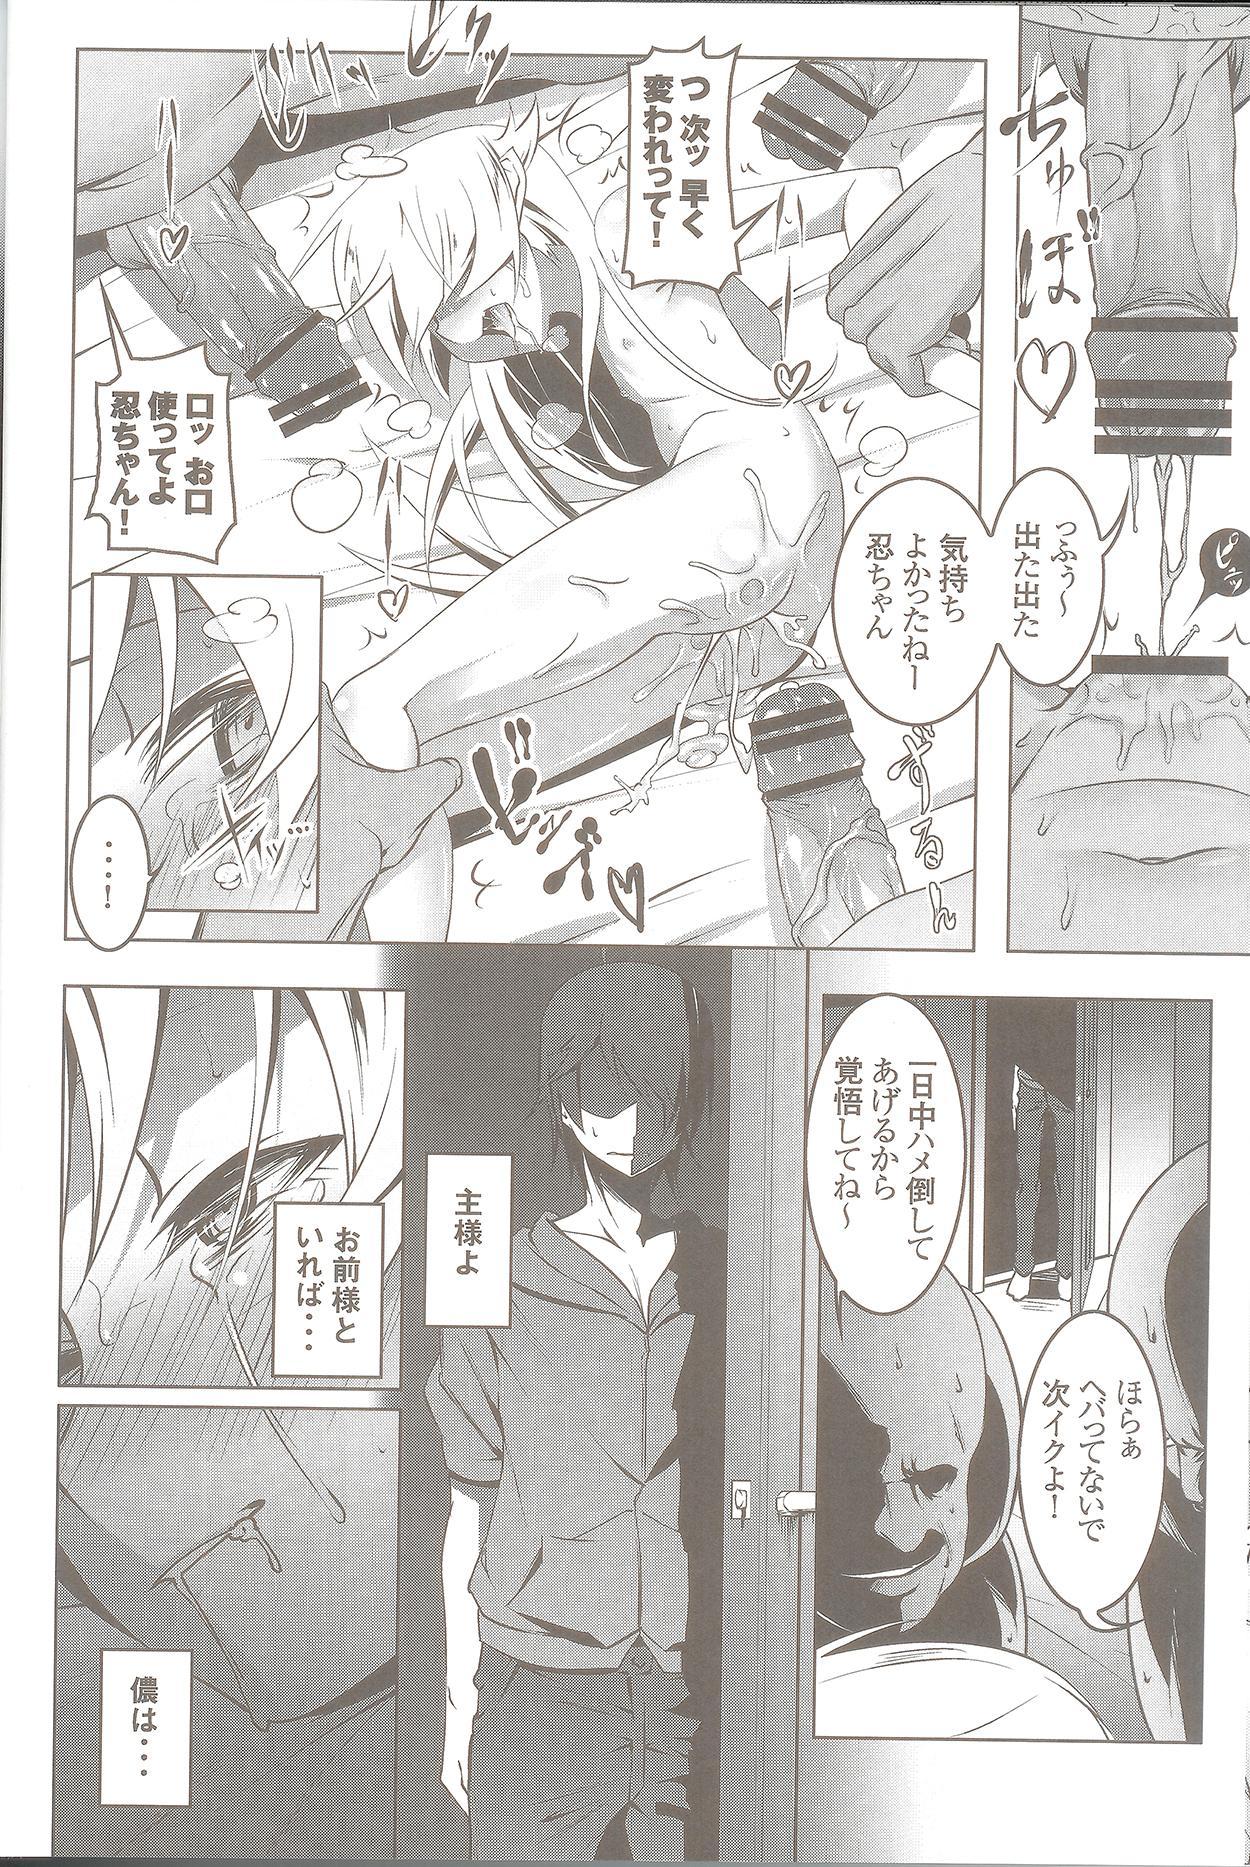 Netoraregatari San 27